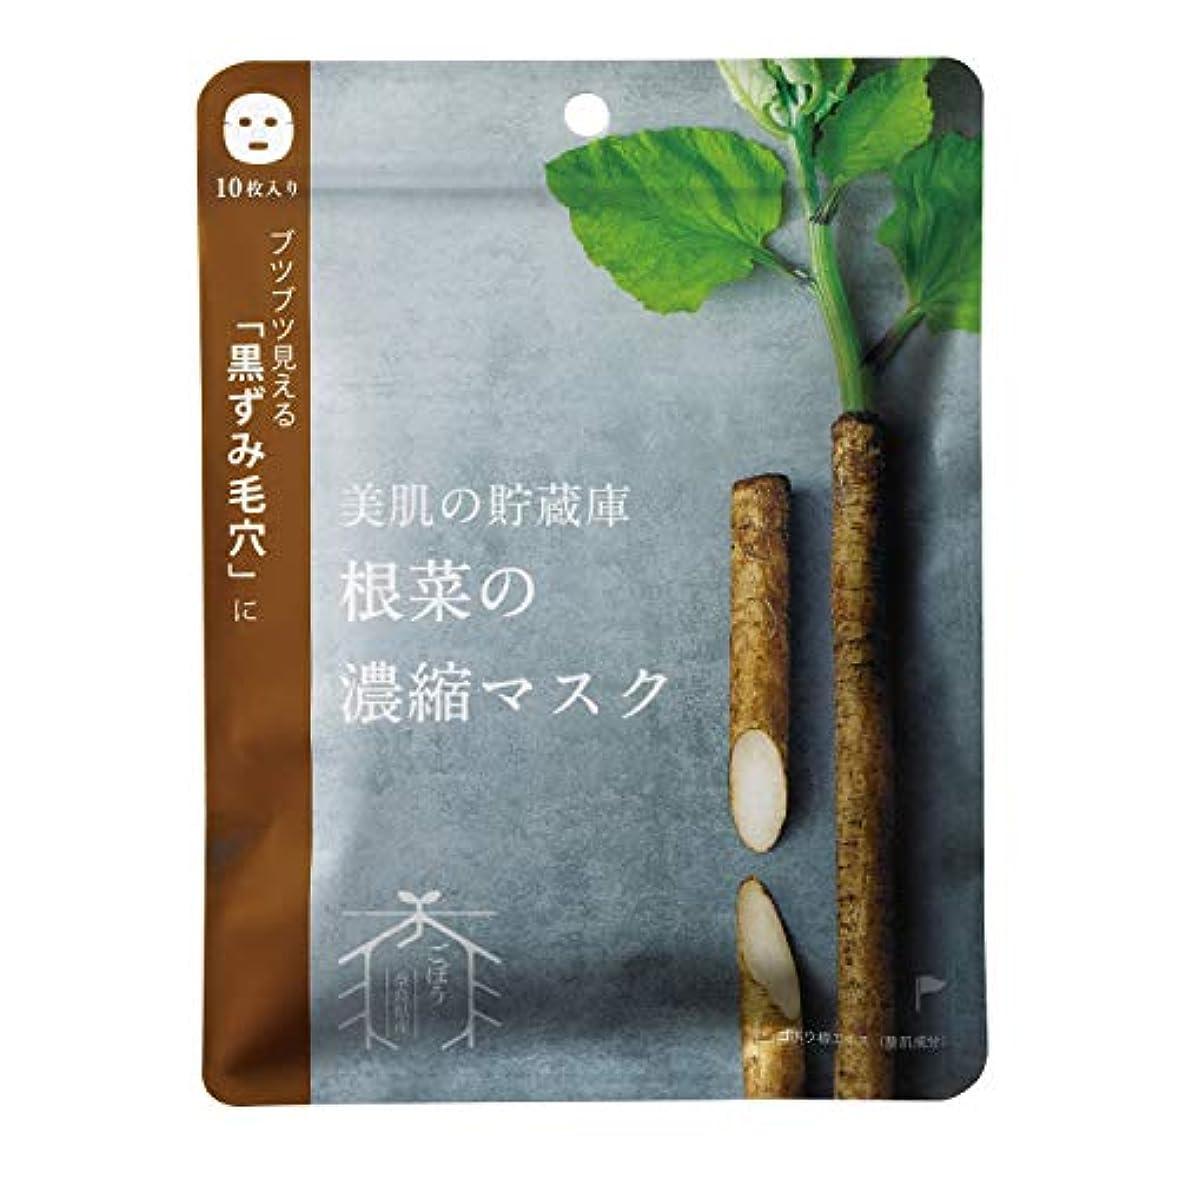 @cosme nippon 美肌の貯蔵庫 根菜の濃縮マスク 宇陀金ごぼう 10枚 160ml